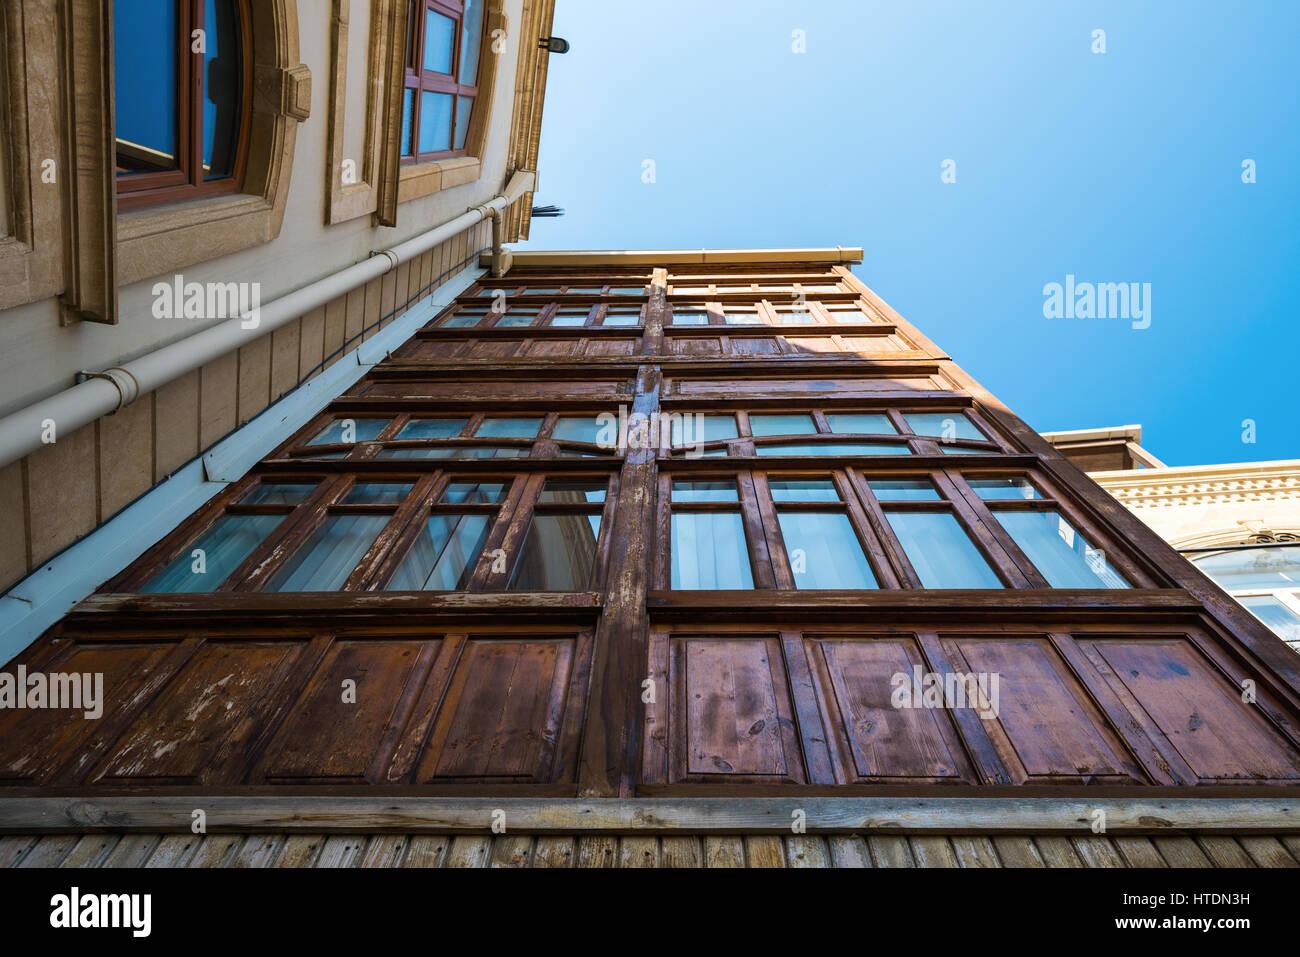 Azerbaijan, Baku, Old town city - Stock Image